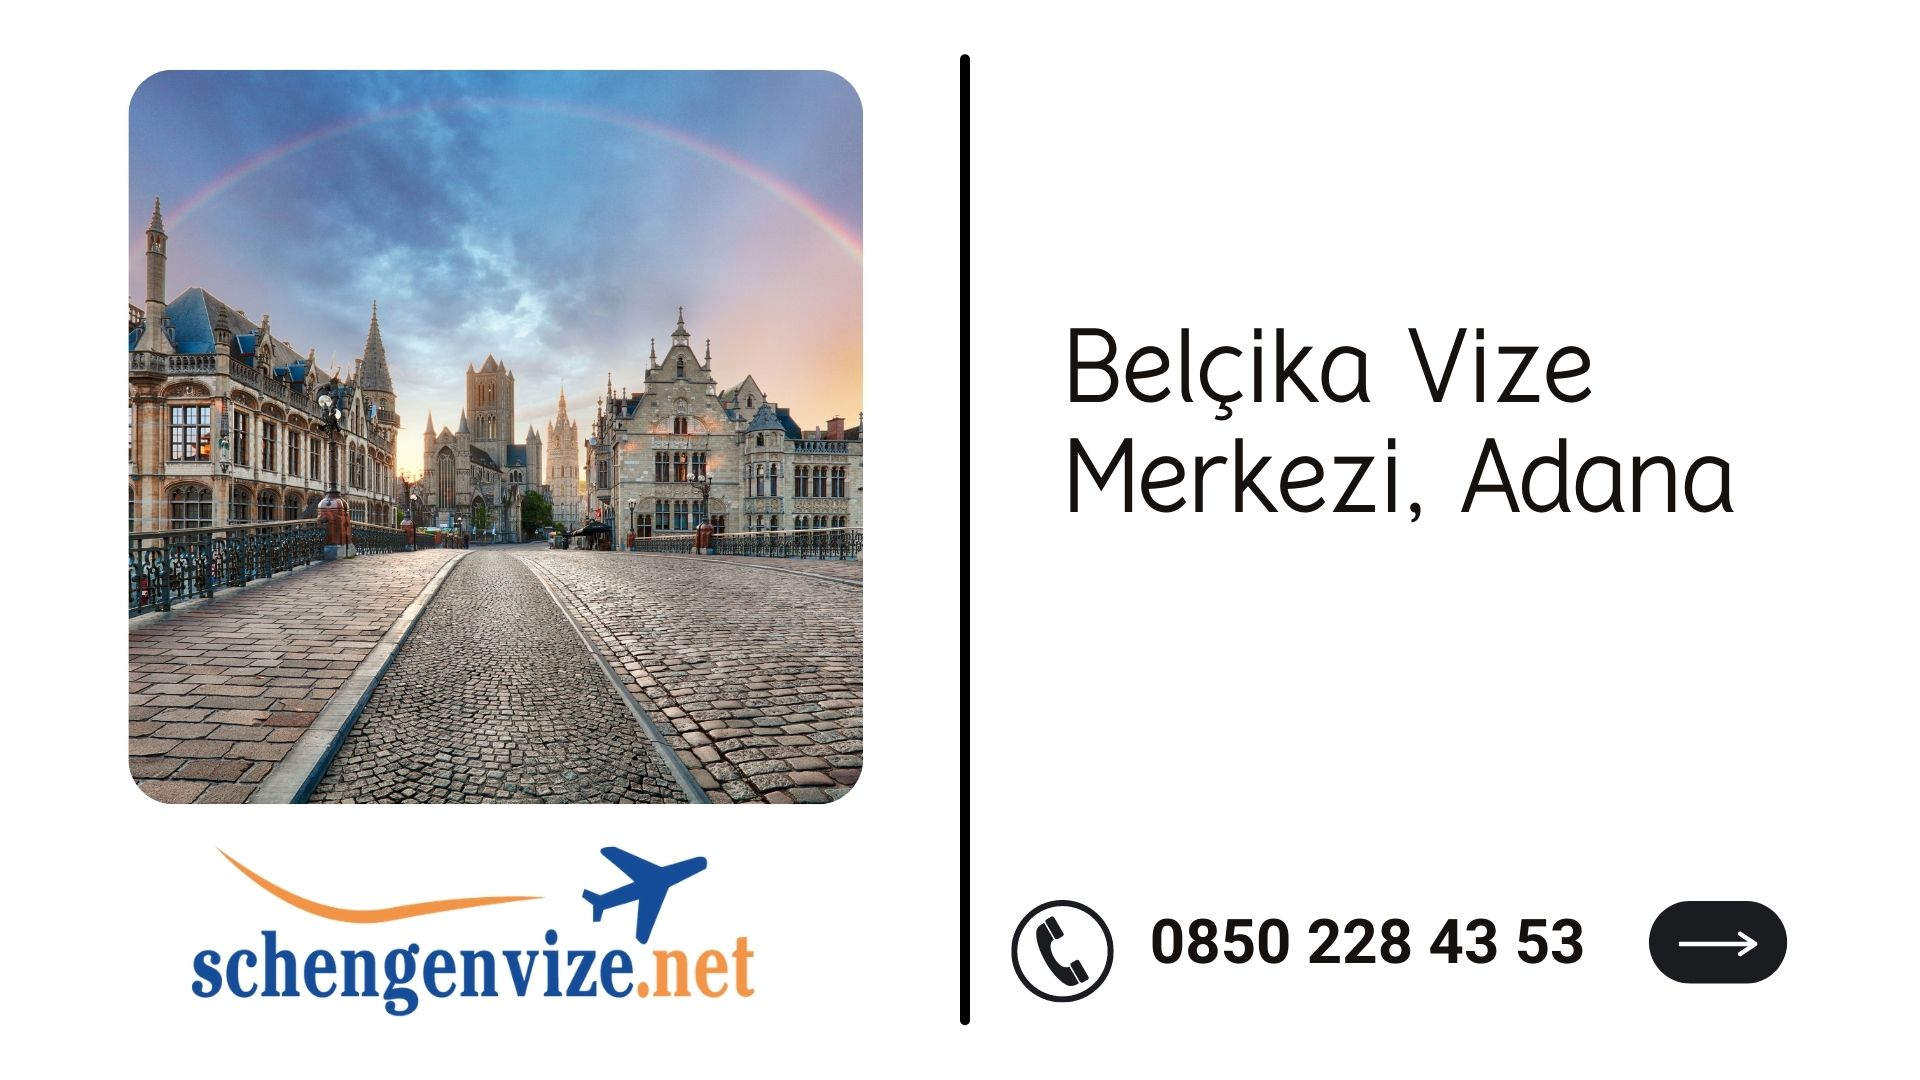 Belçika Vize Merkezi, Adana